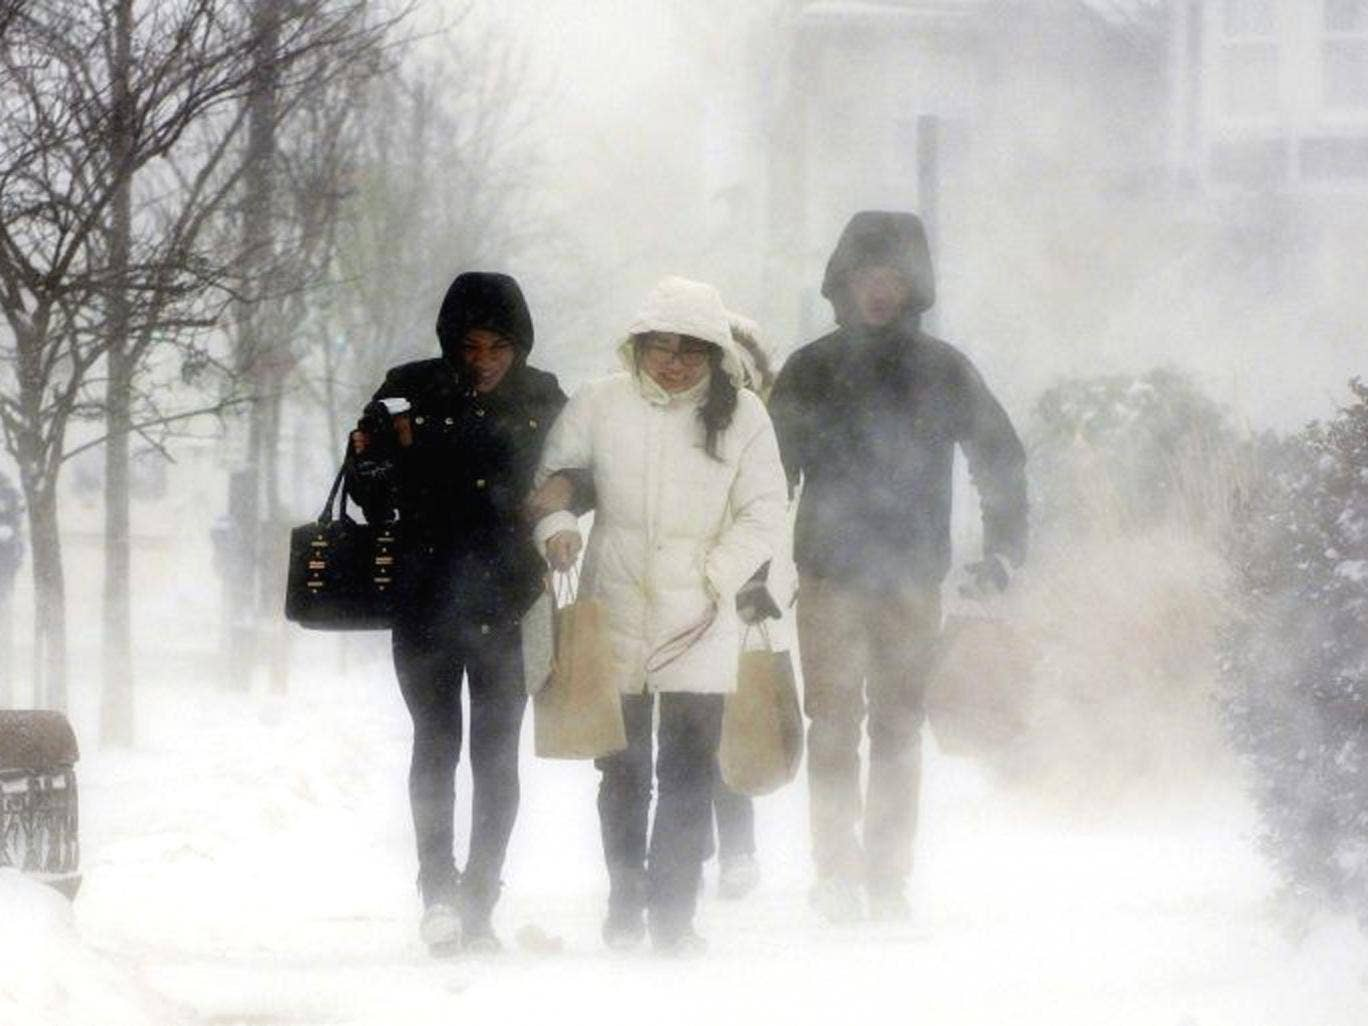 Elmwood Village residents walk down Elmwood Avenue in Buffalo, New York